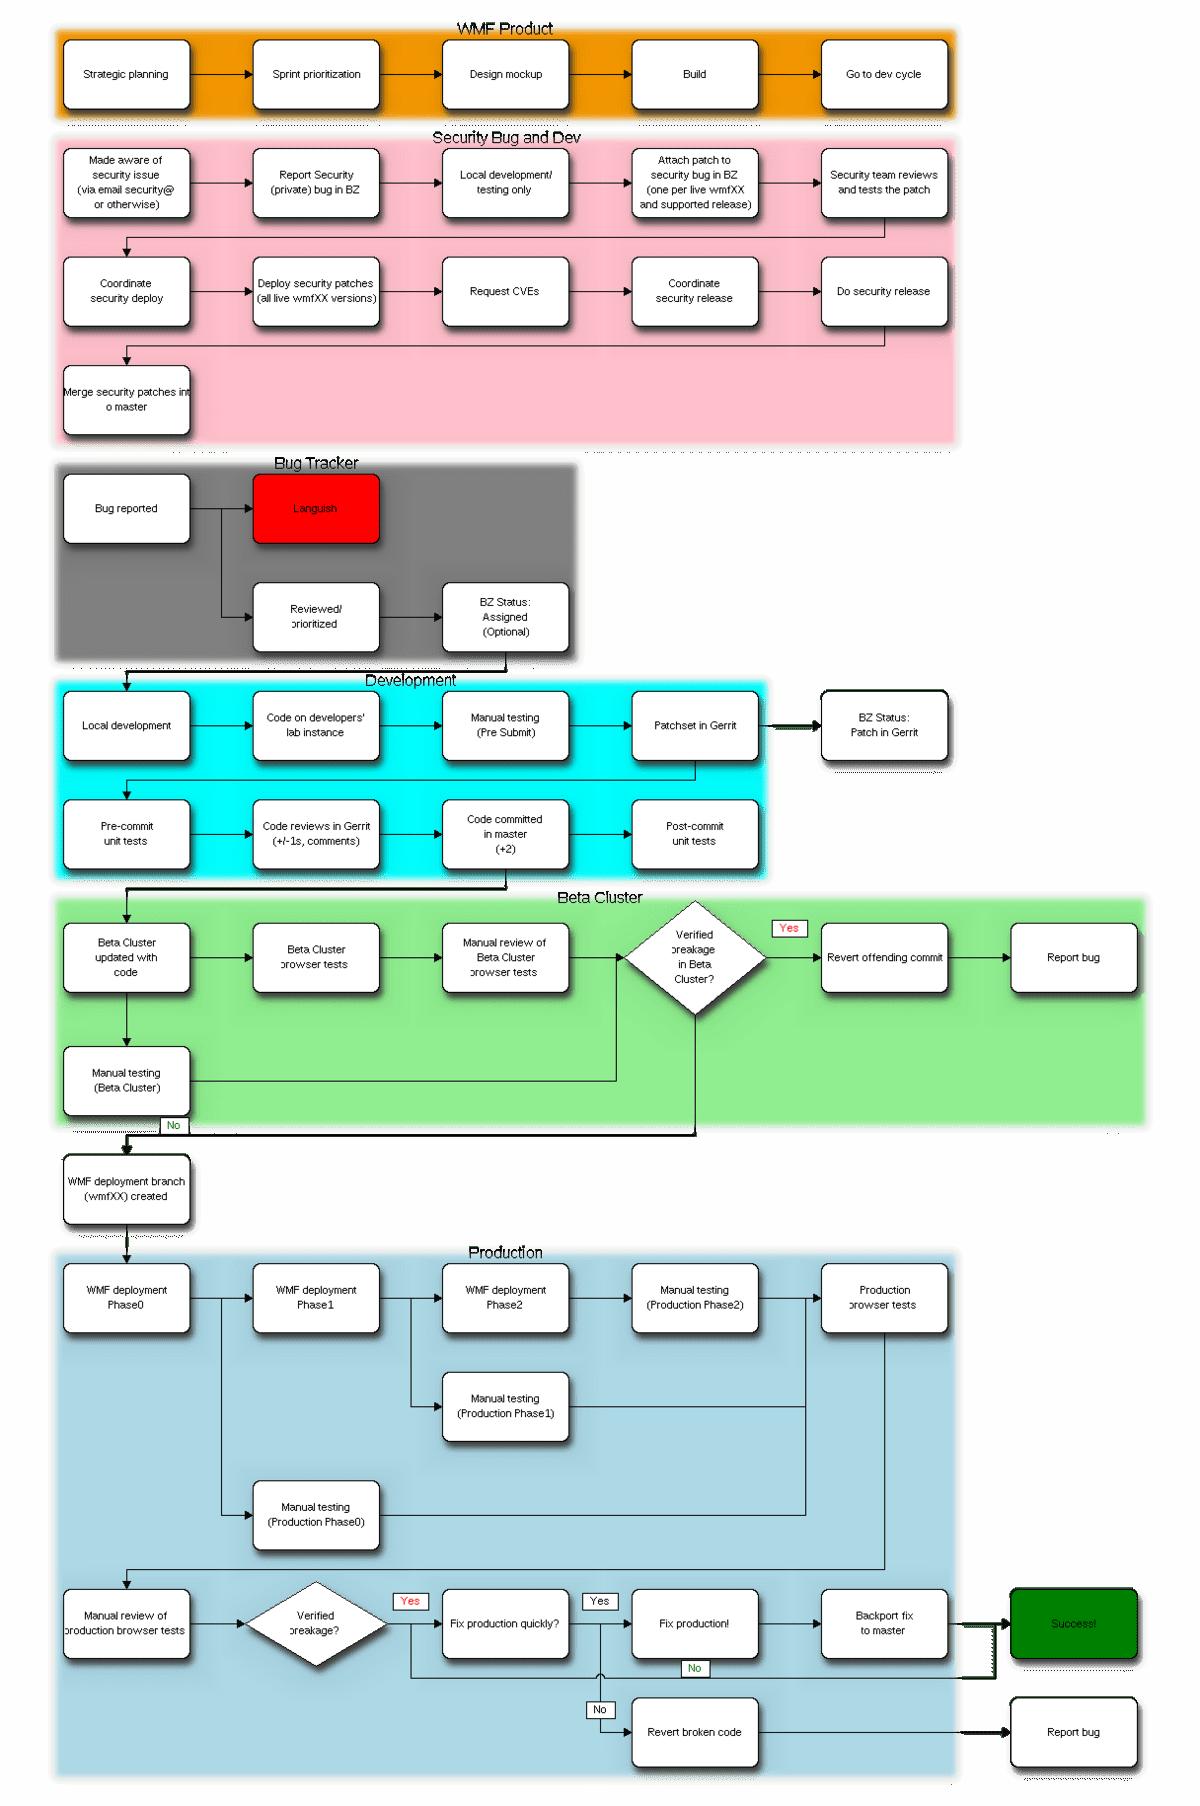 software release process flow diagram cal spa 2100 wiring deployment flowchart wikipedia